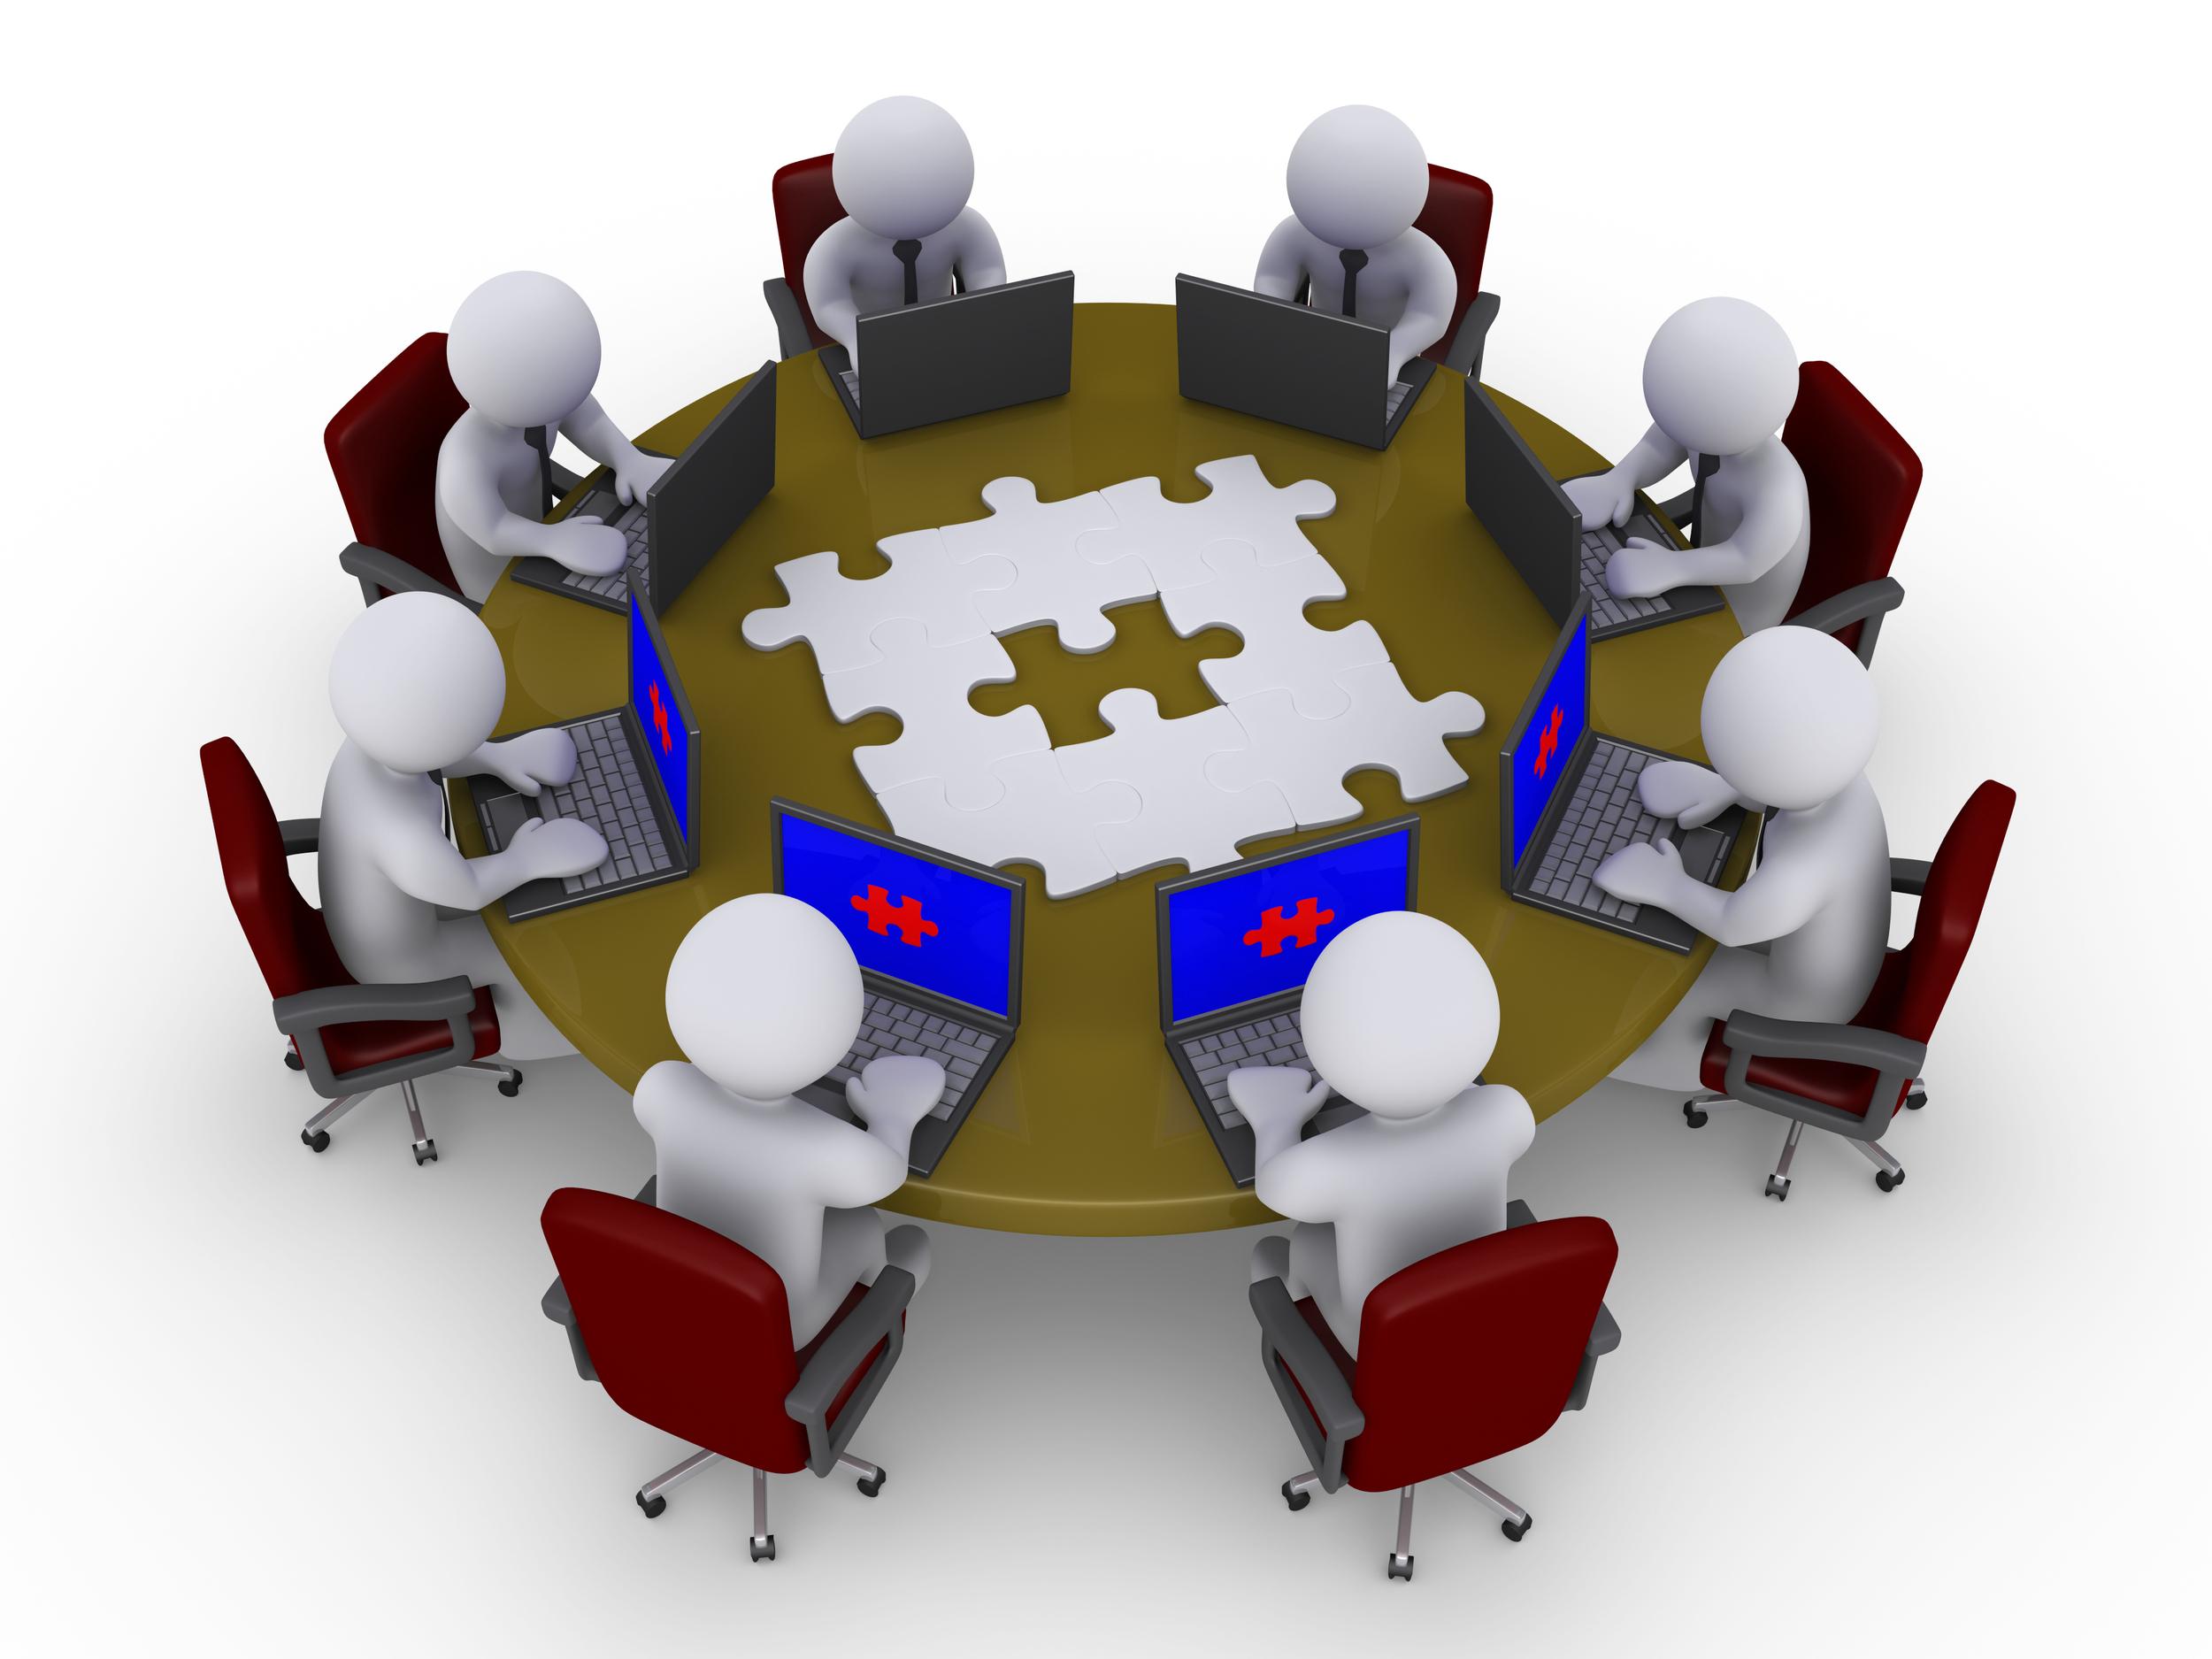 bigstock-Businessmen-Around-Table-Searc-31704239.jpg